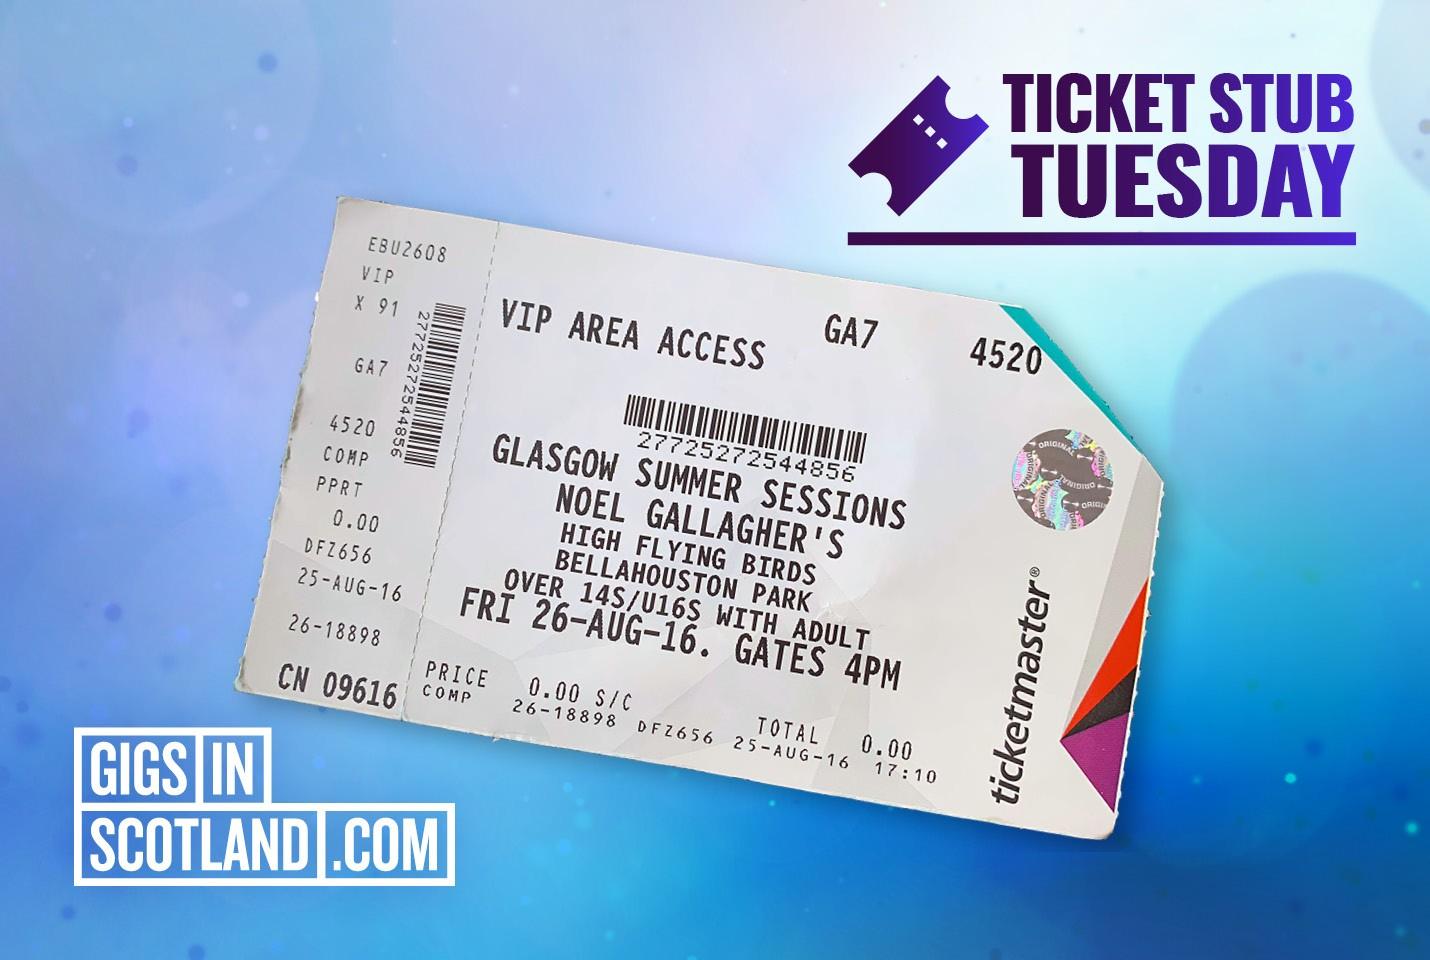 Ticket Stub Tuesday - Noel Gallagher's High Flying Birds